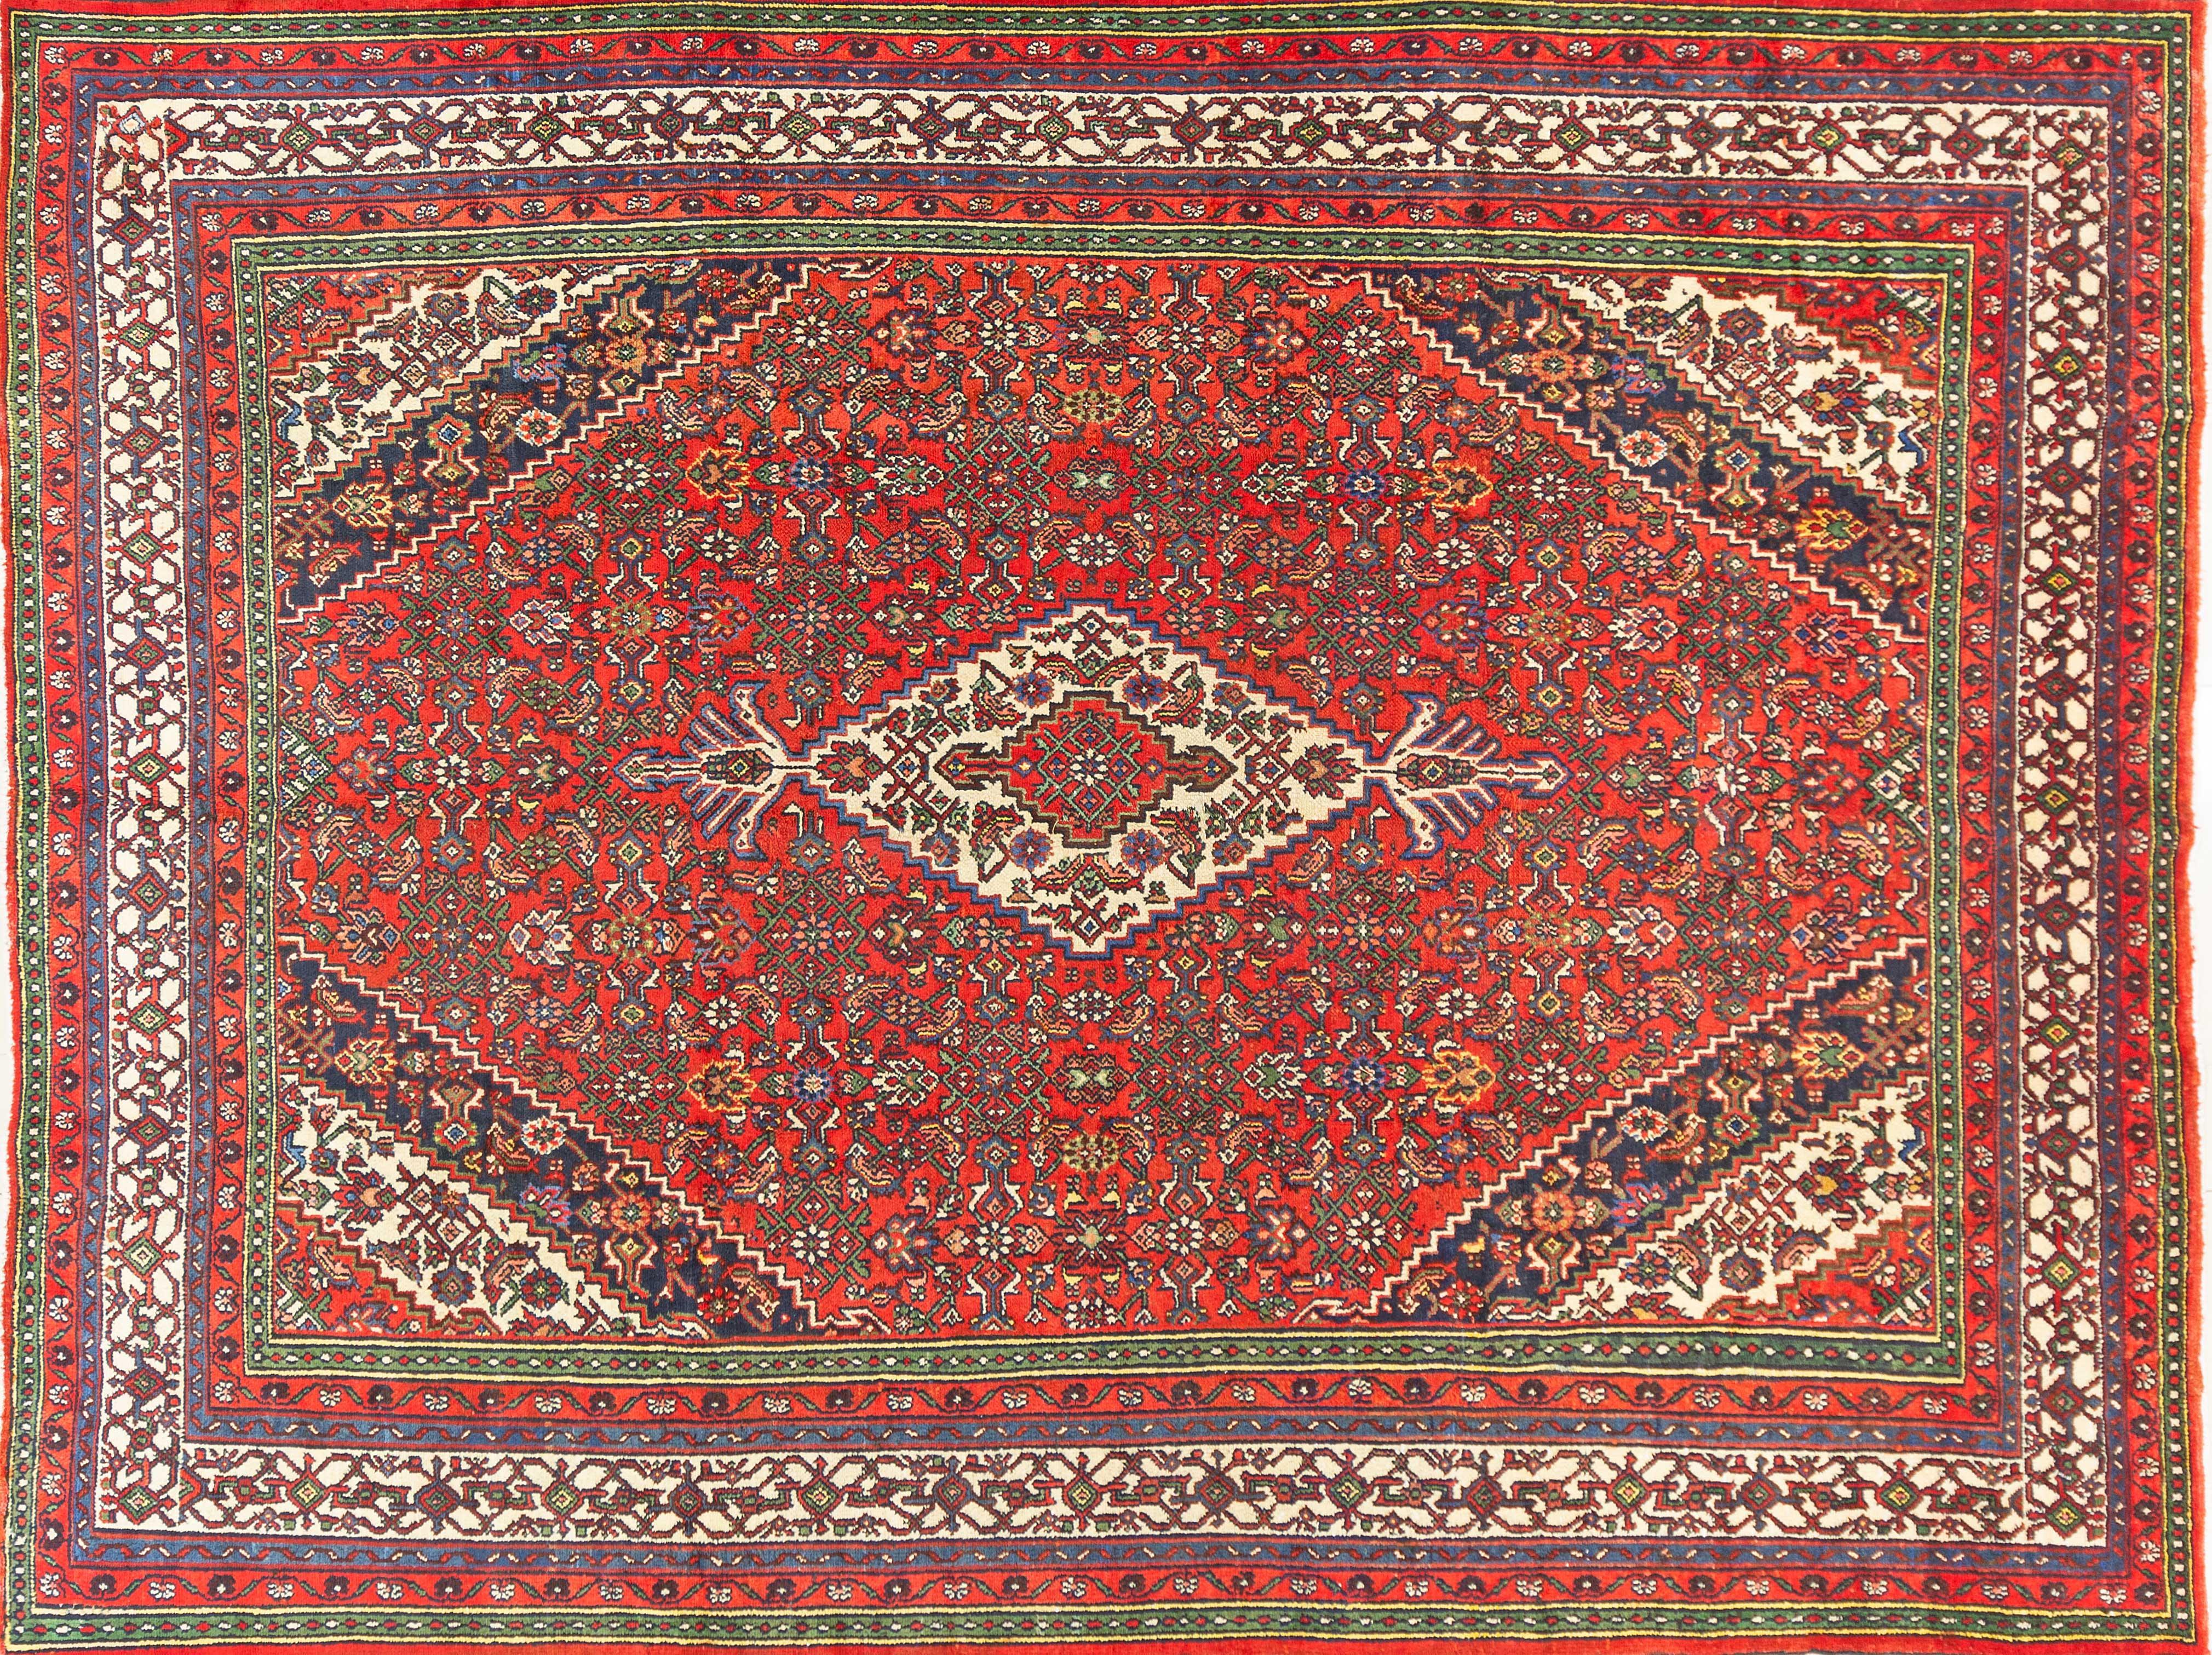 A Persian Hand Knotted Toiserkan Carpet, 356 x 268